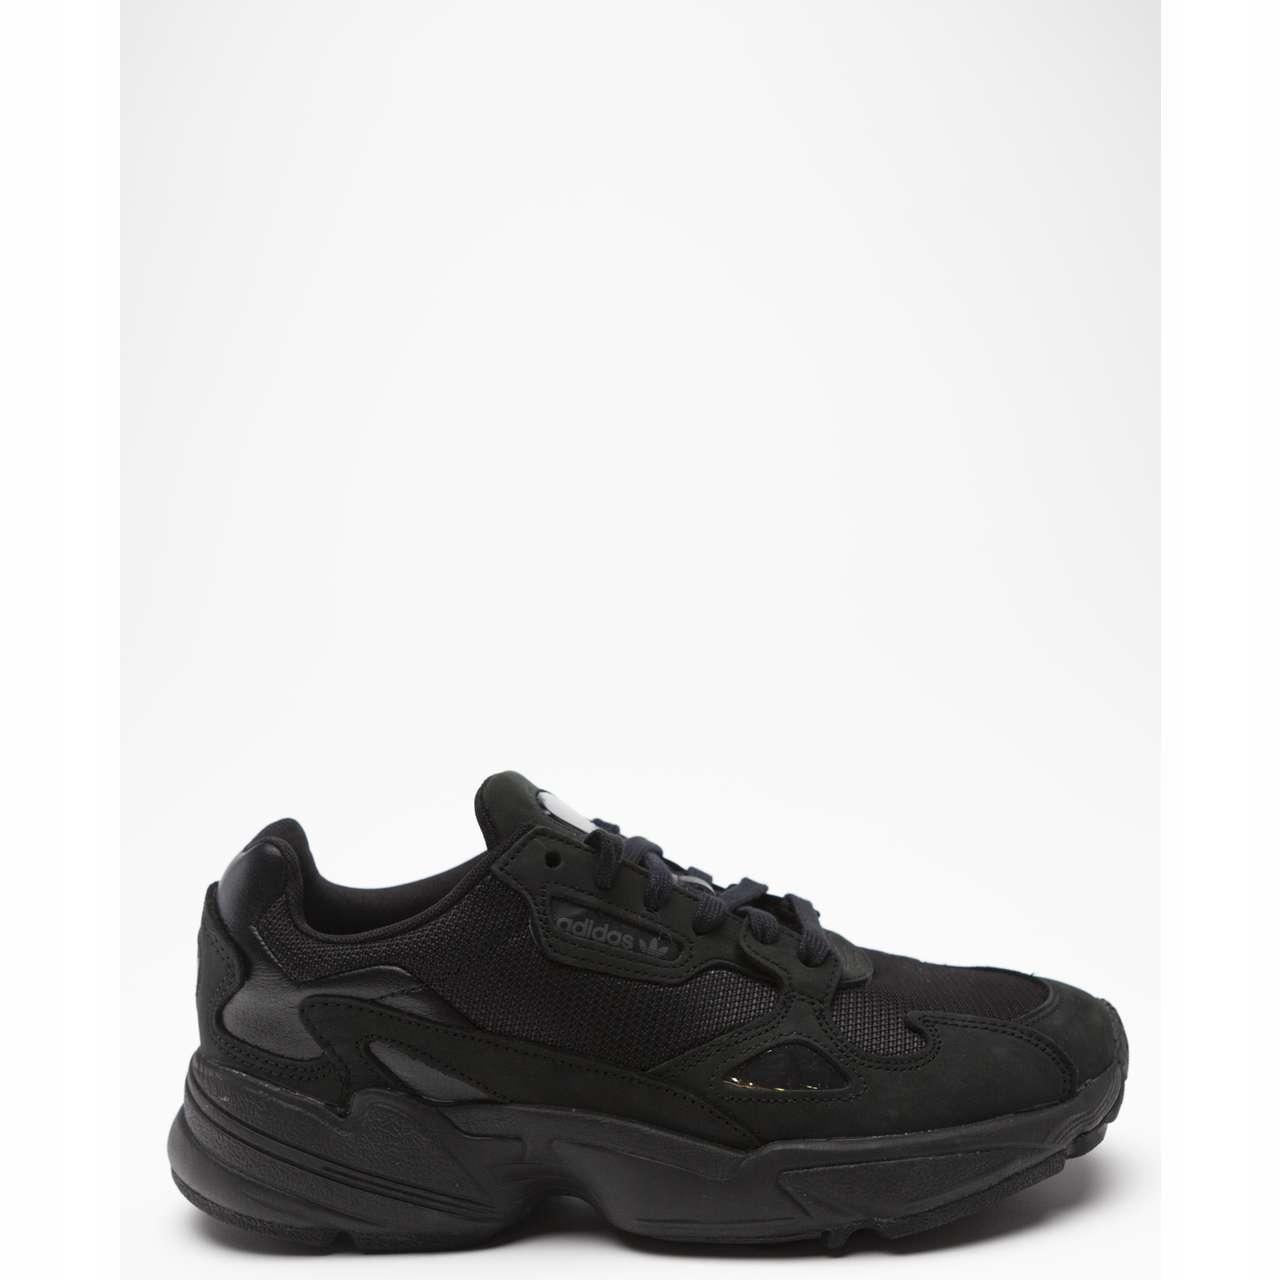 Sneakers damskie buty Adidas Originals Falcon W core black grey five (G26880)